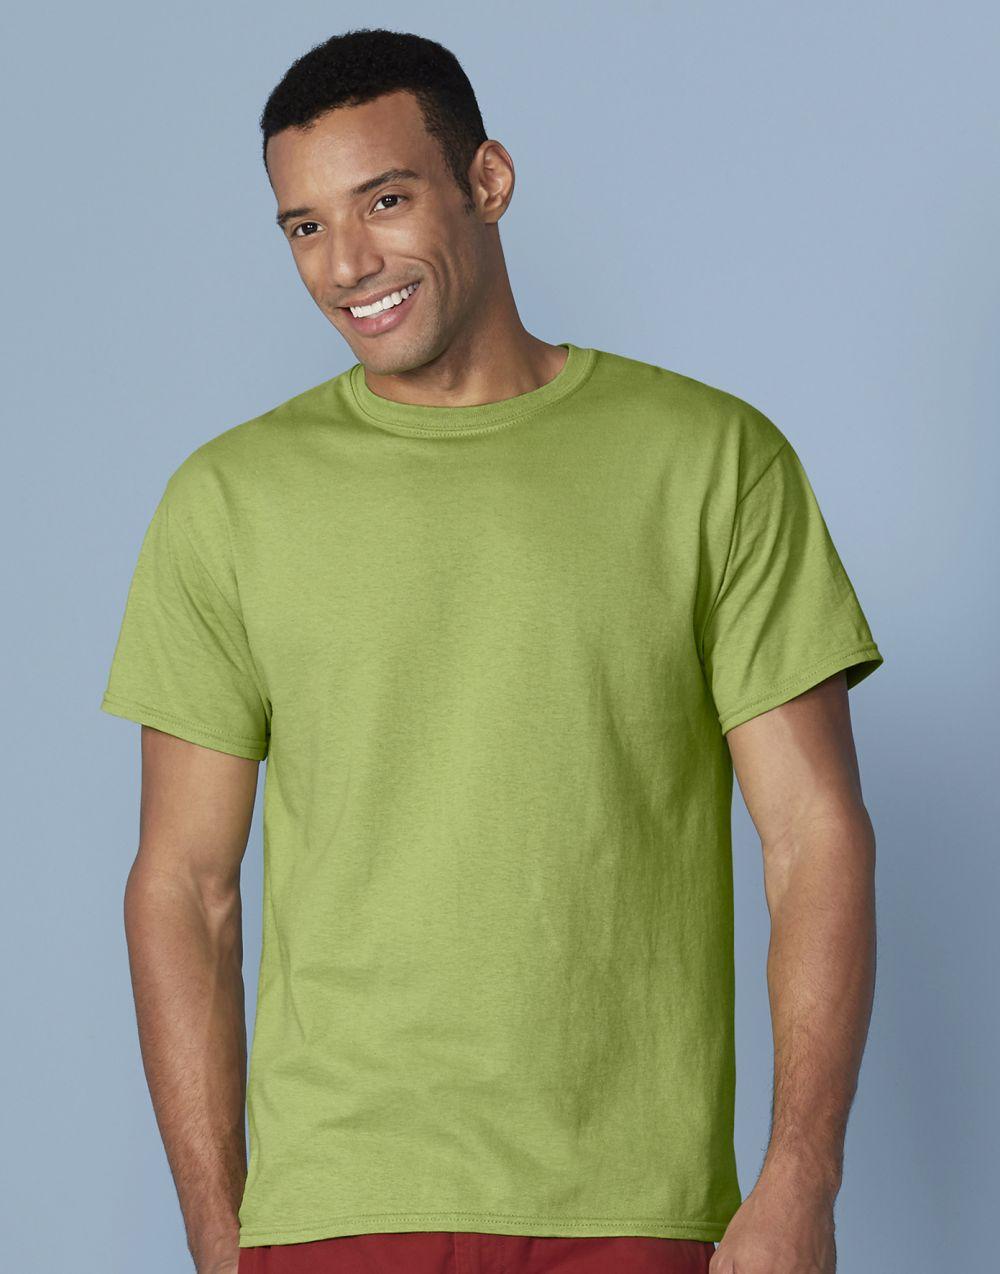 Camisetas manga corta gildan ultra imagen 3